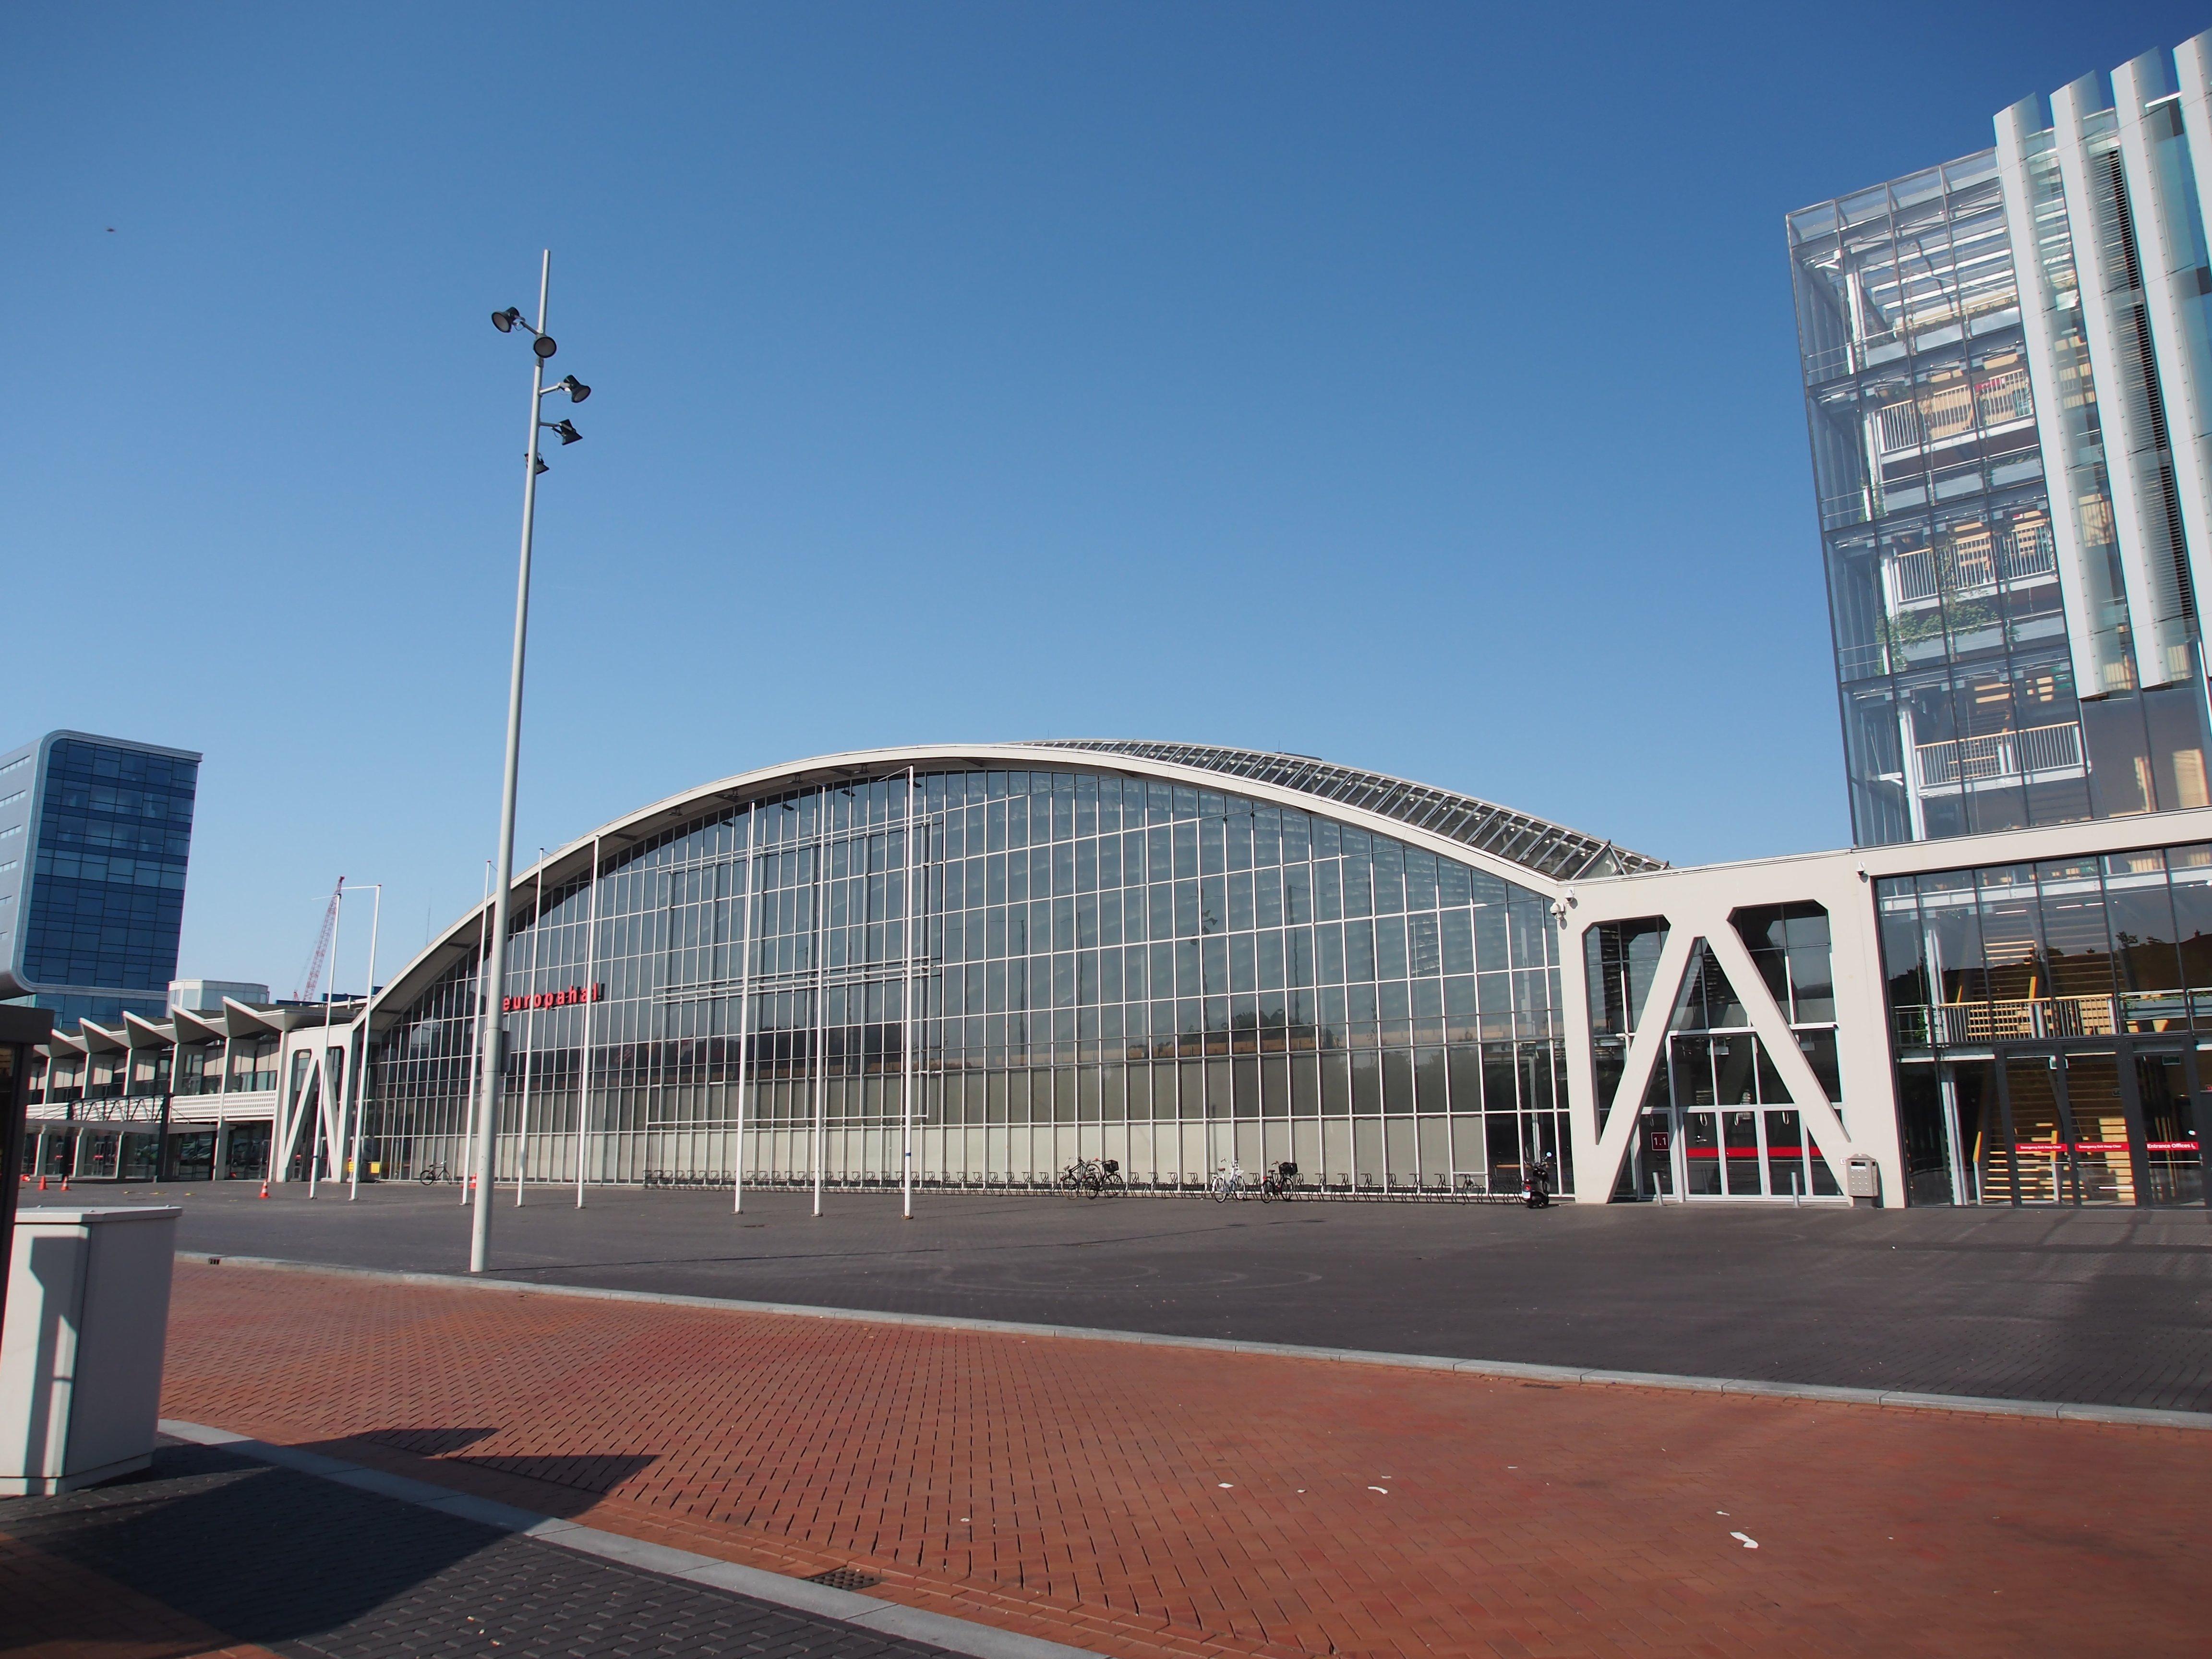 Europaplein,_RAI,_Amsterdam_pic2